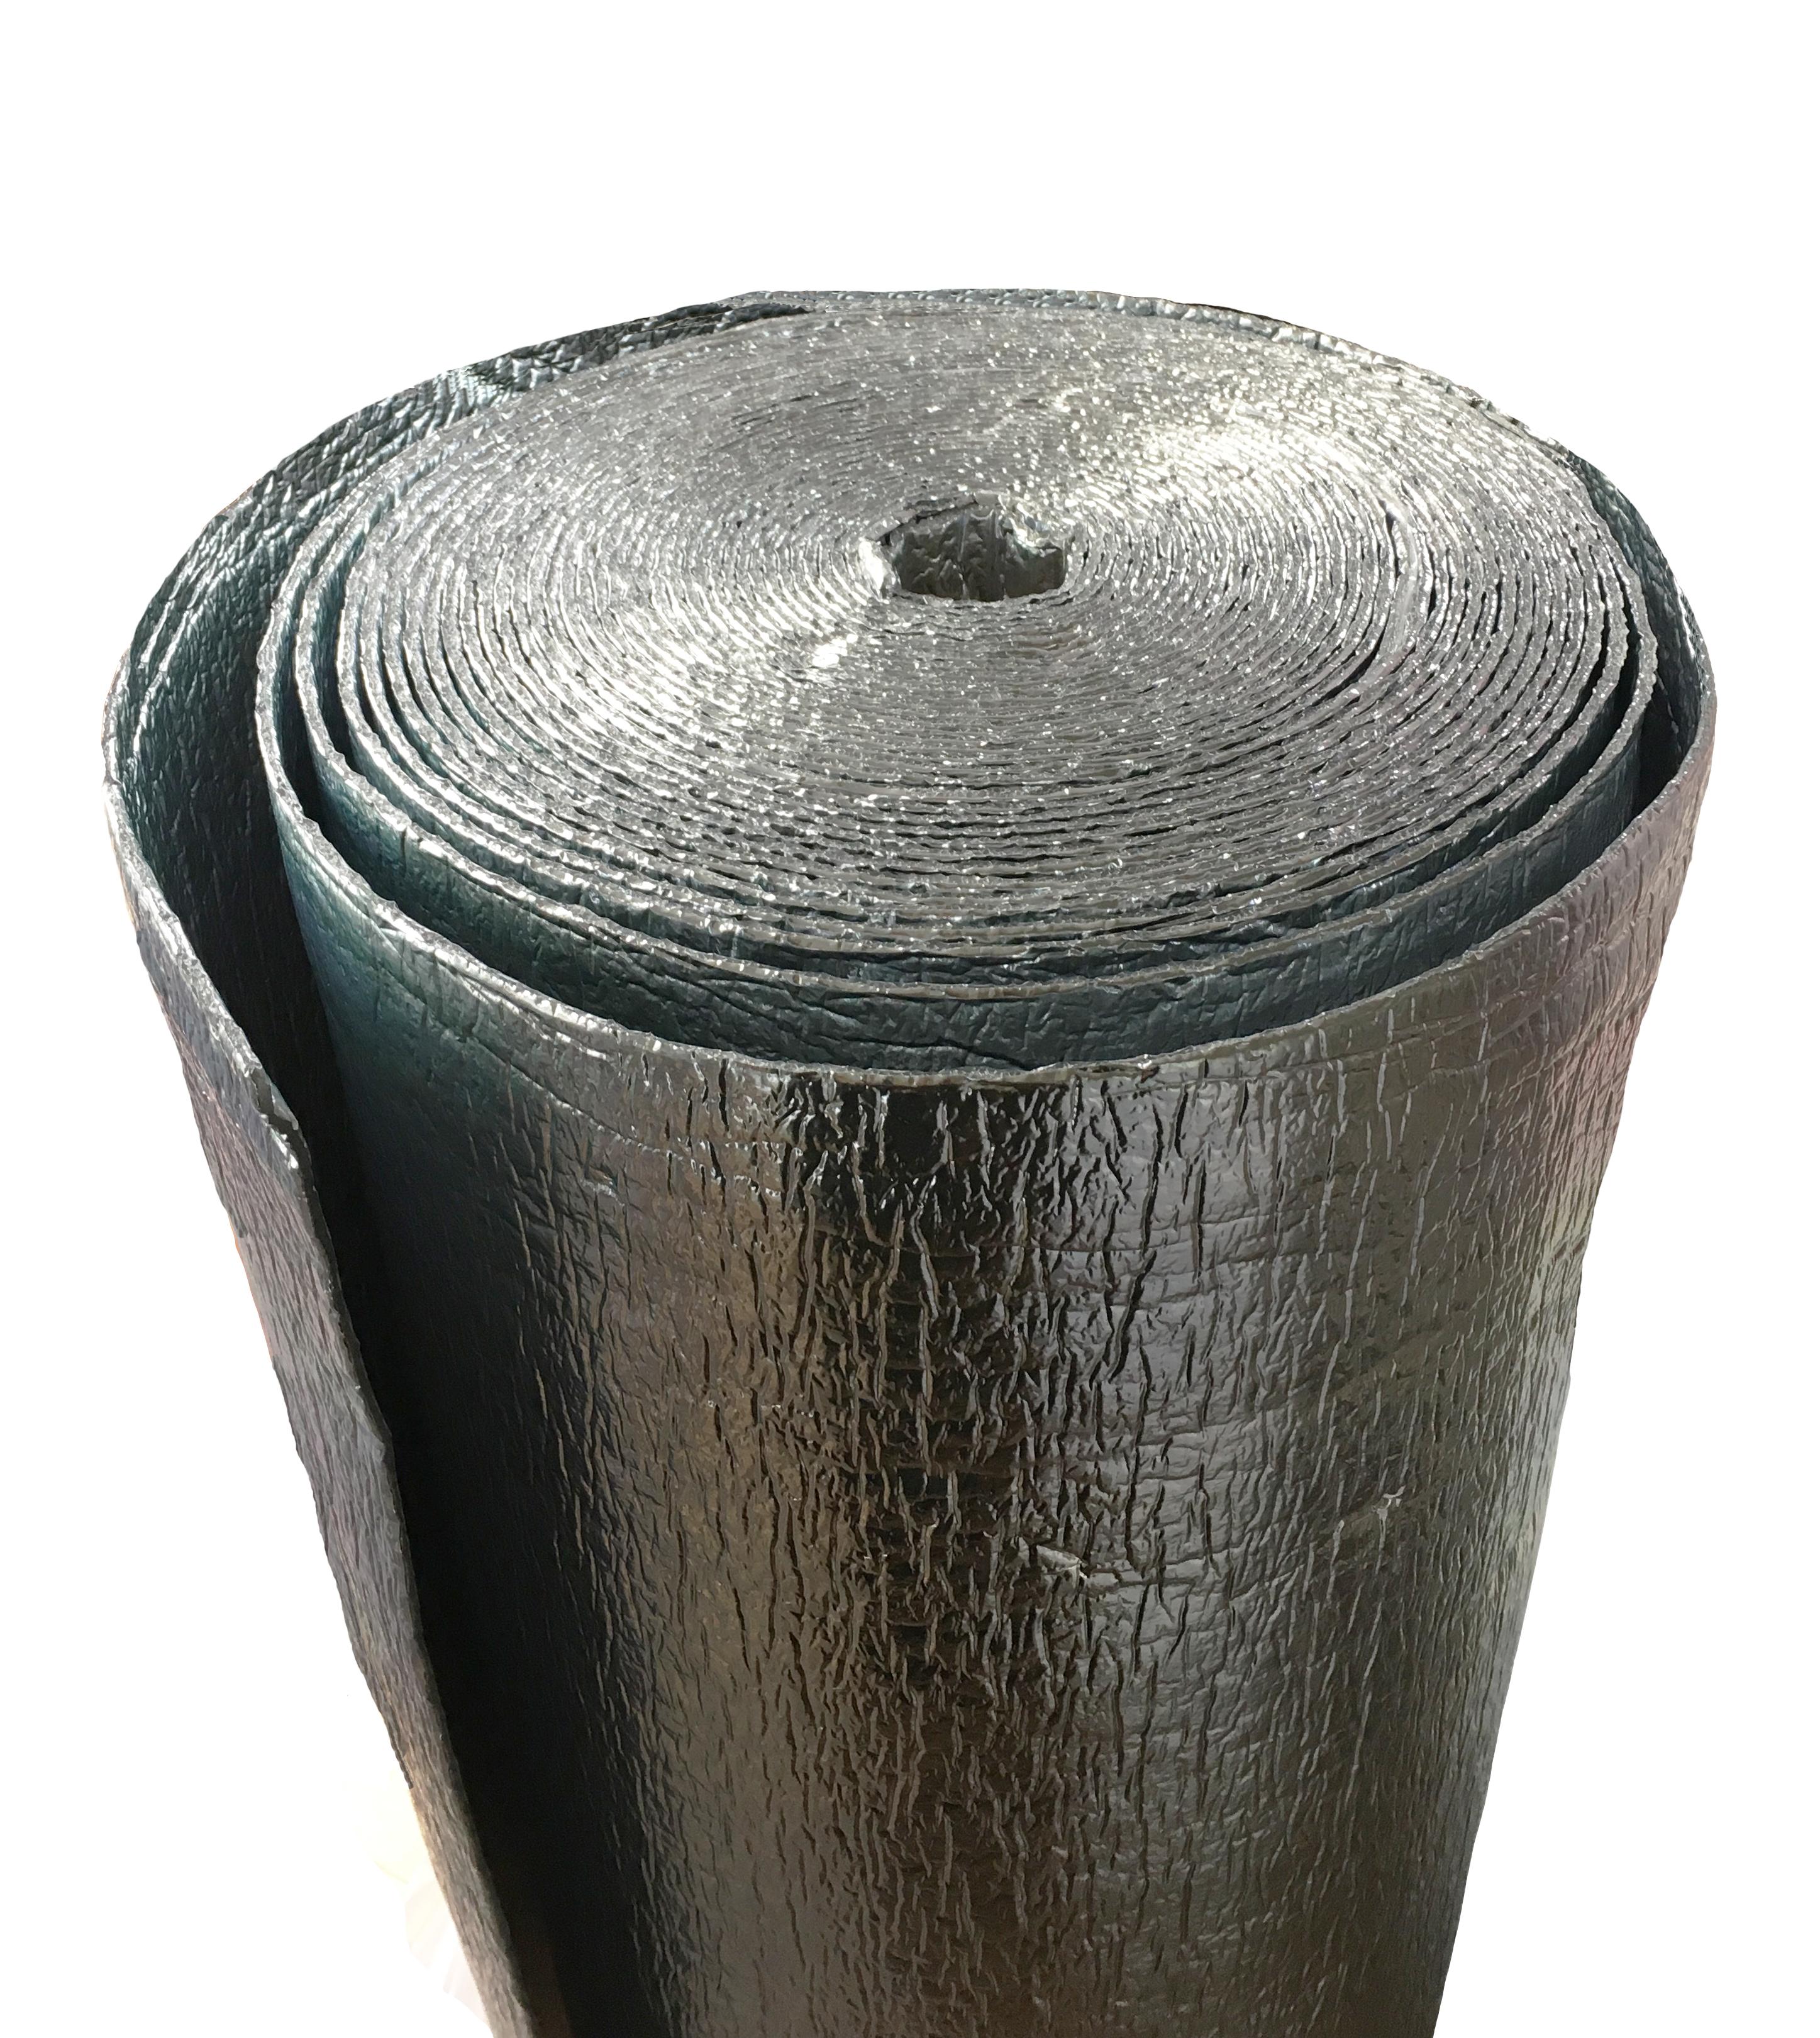 Multifoil-Insulation.com